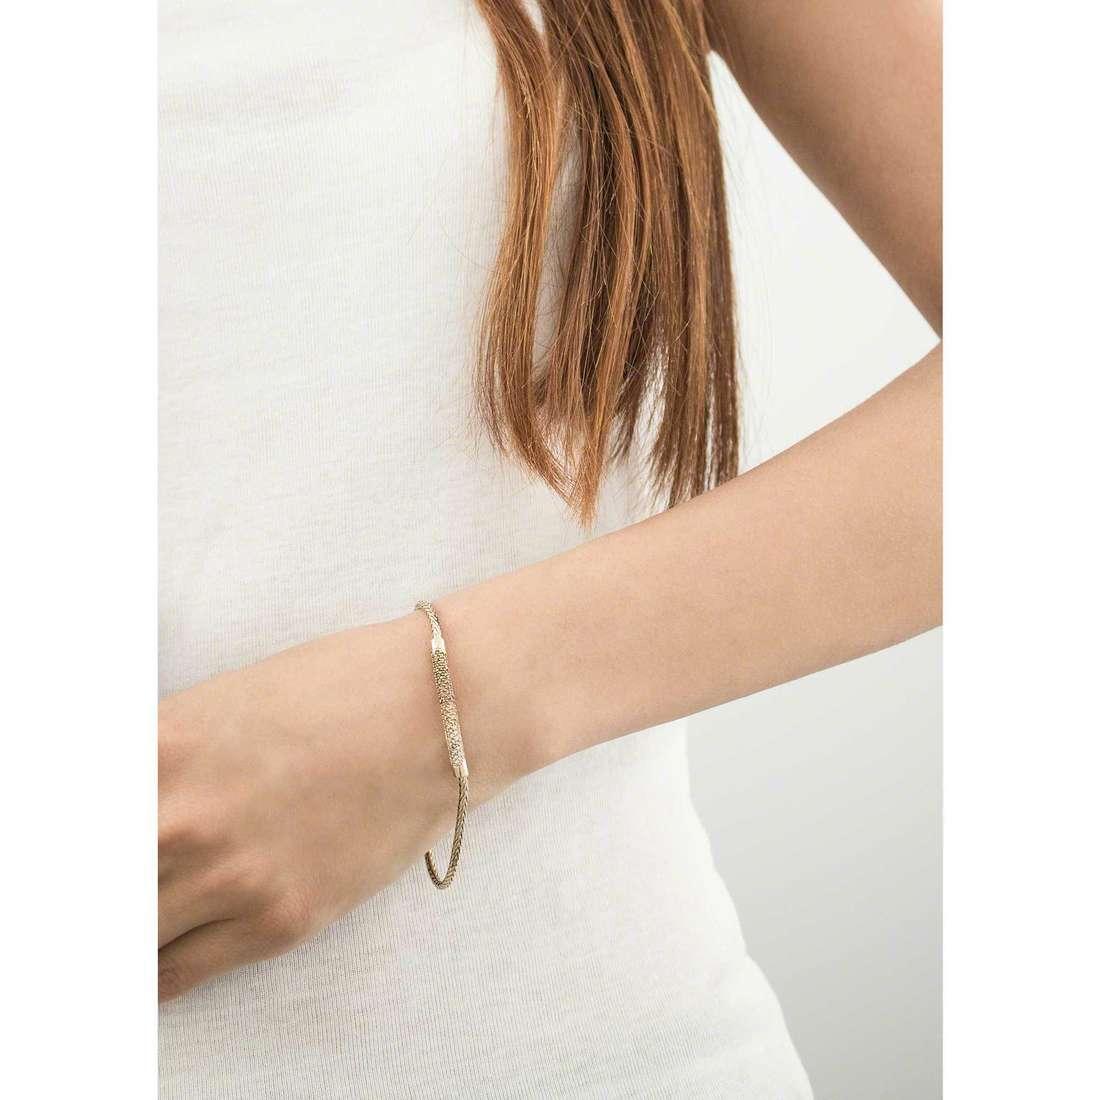 Fossil bracciali Holiday 15 donna JA6765710 indosso